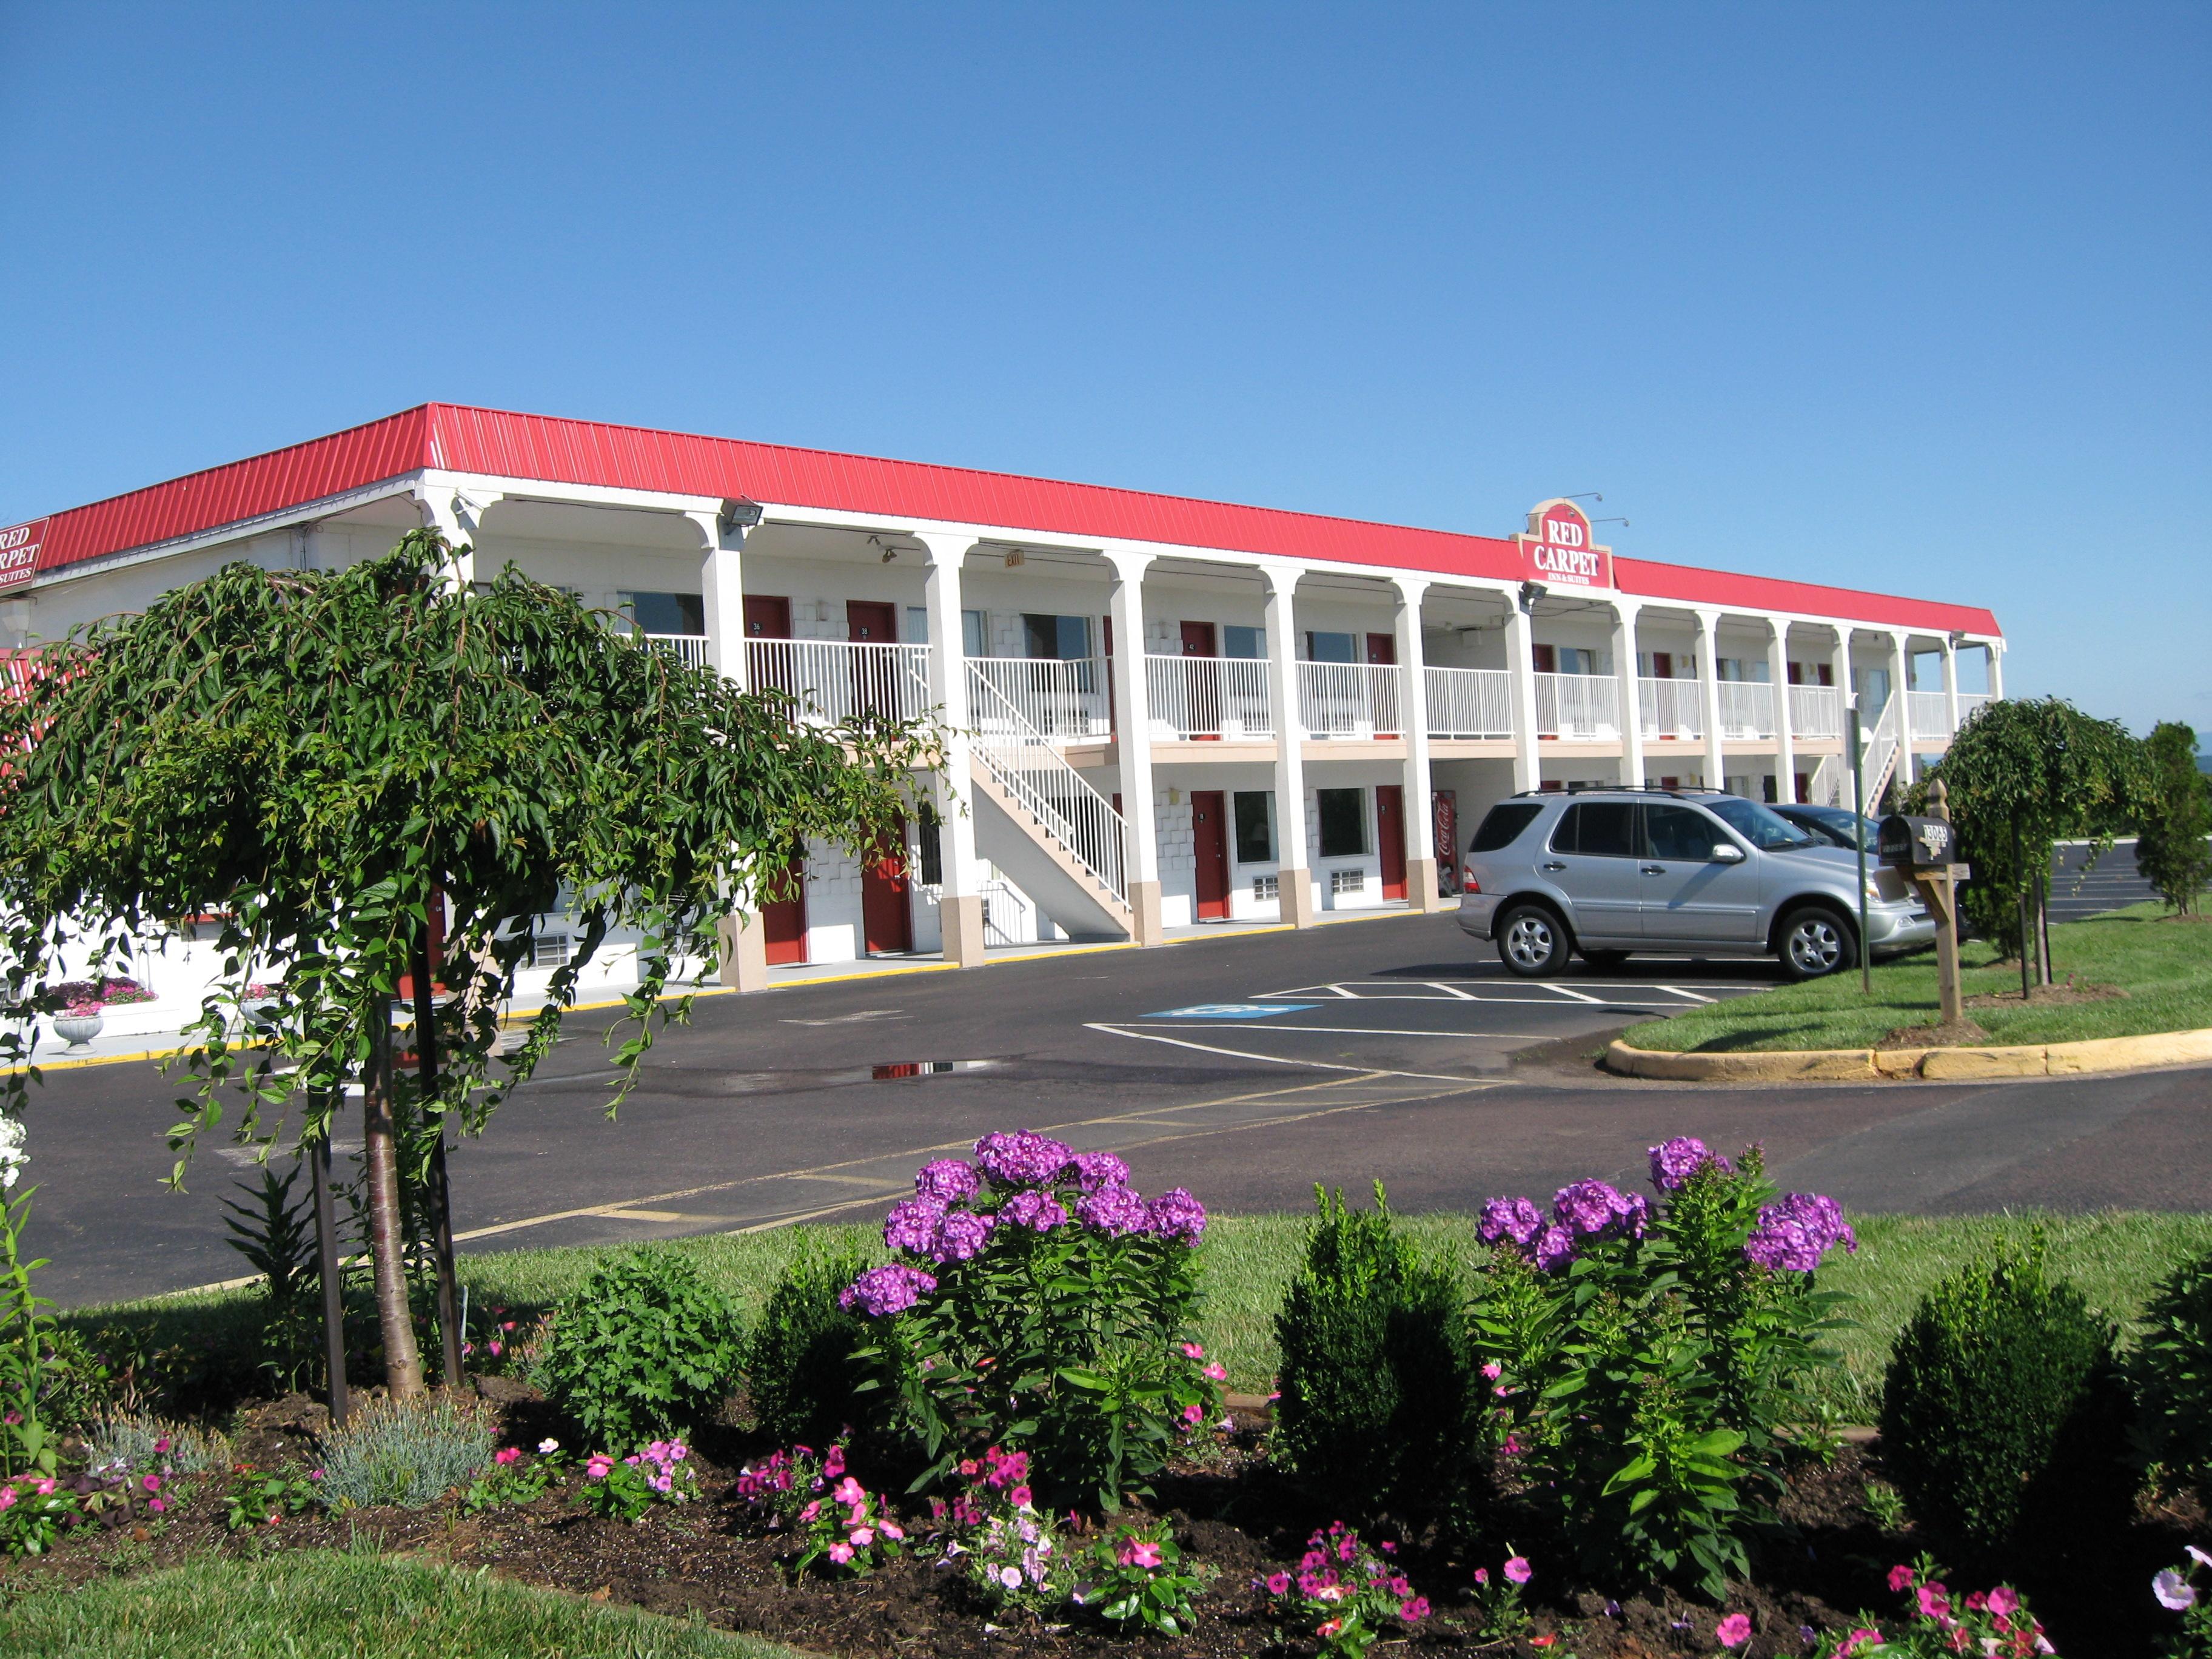 Red Carpet Inn Amp Suites In Culpeper Va Whitepages